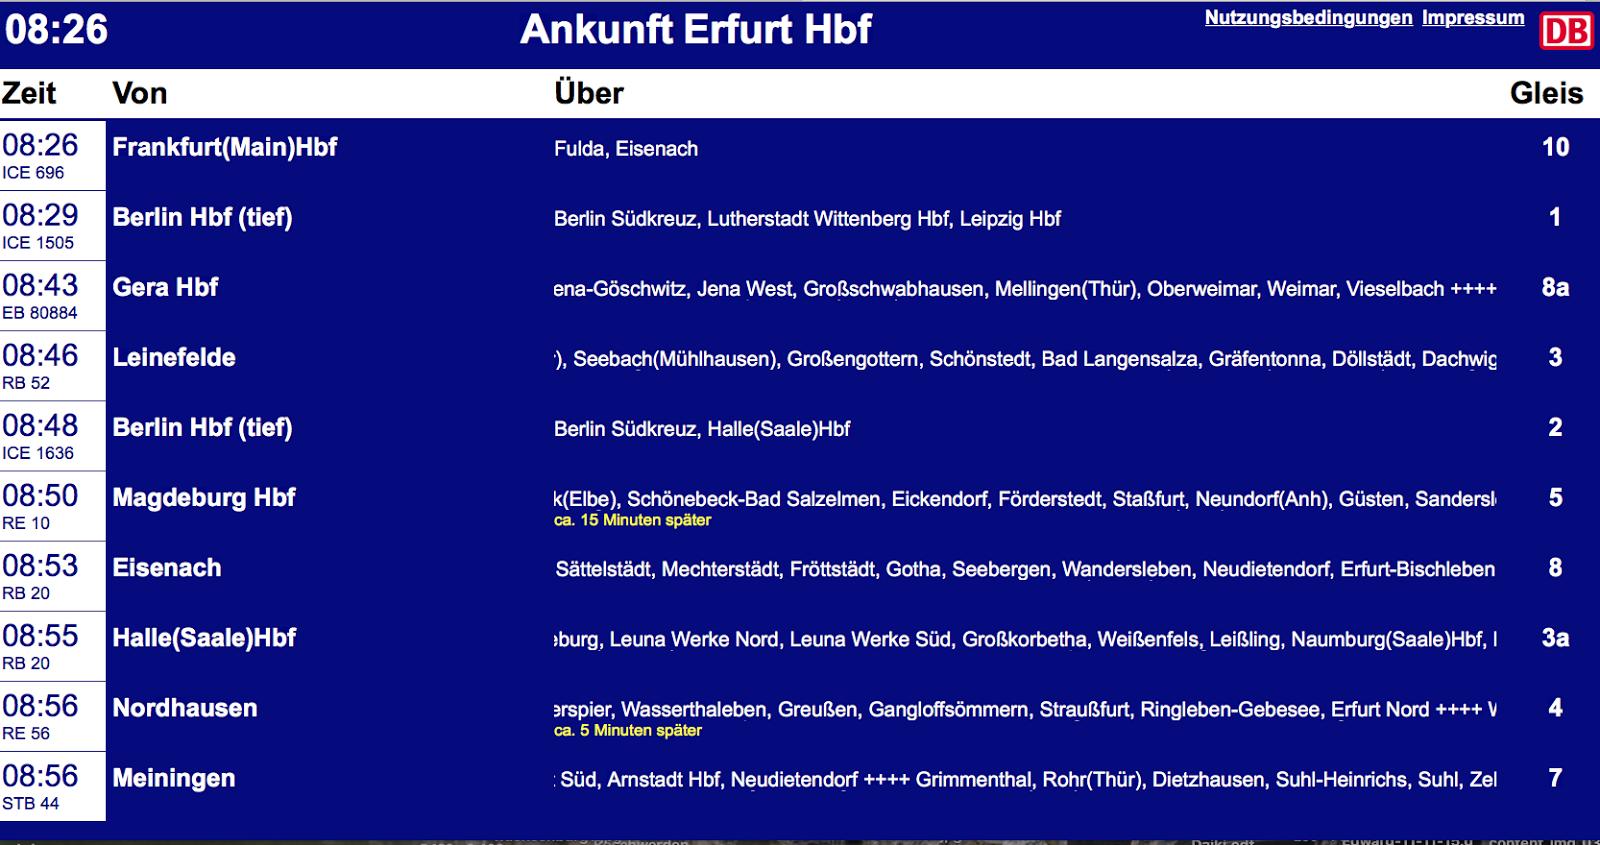 Ankunft Hbf Erfurt